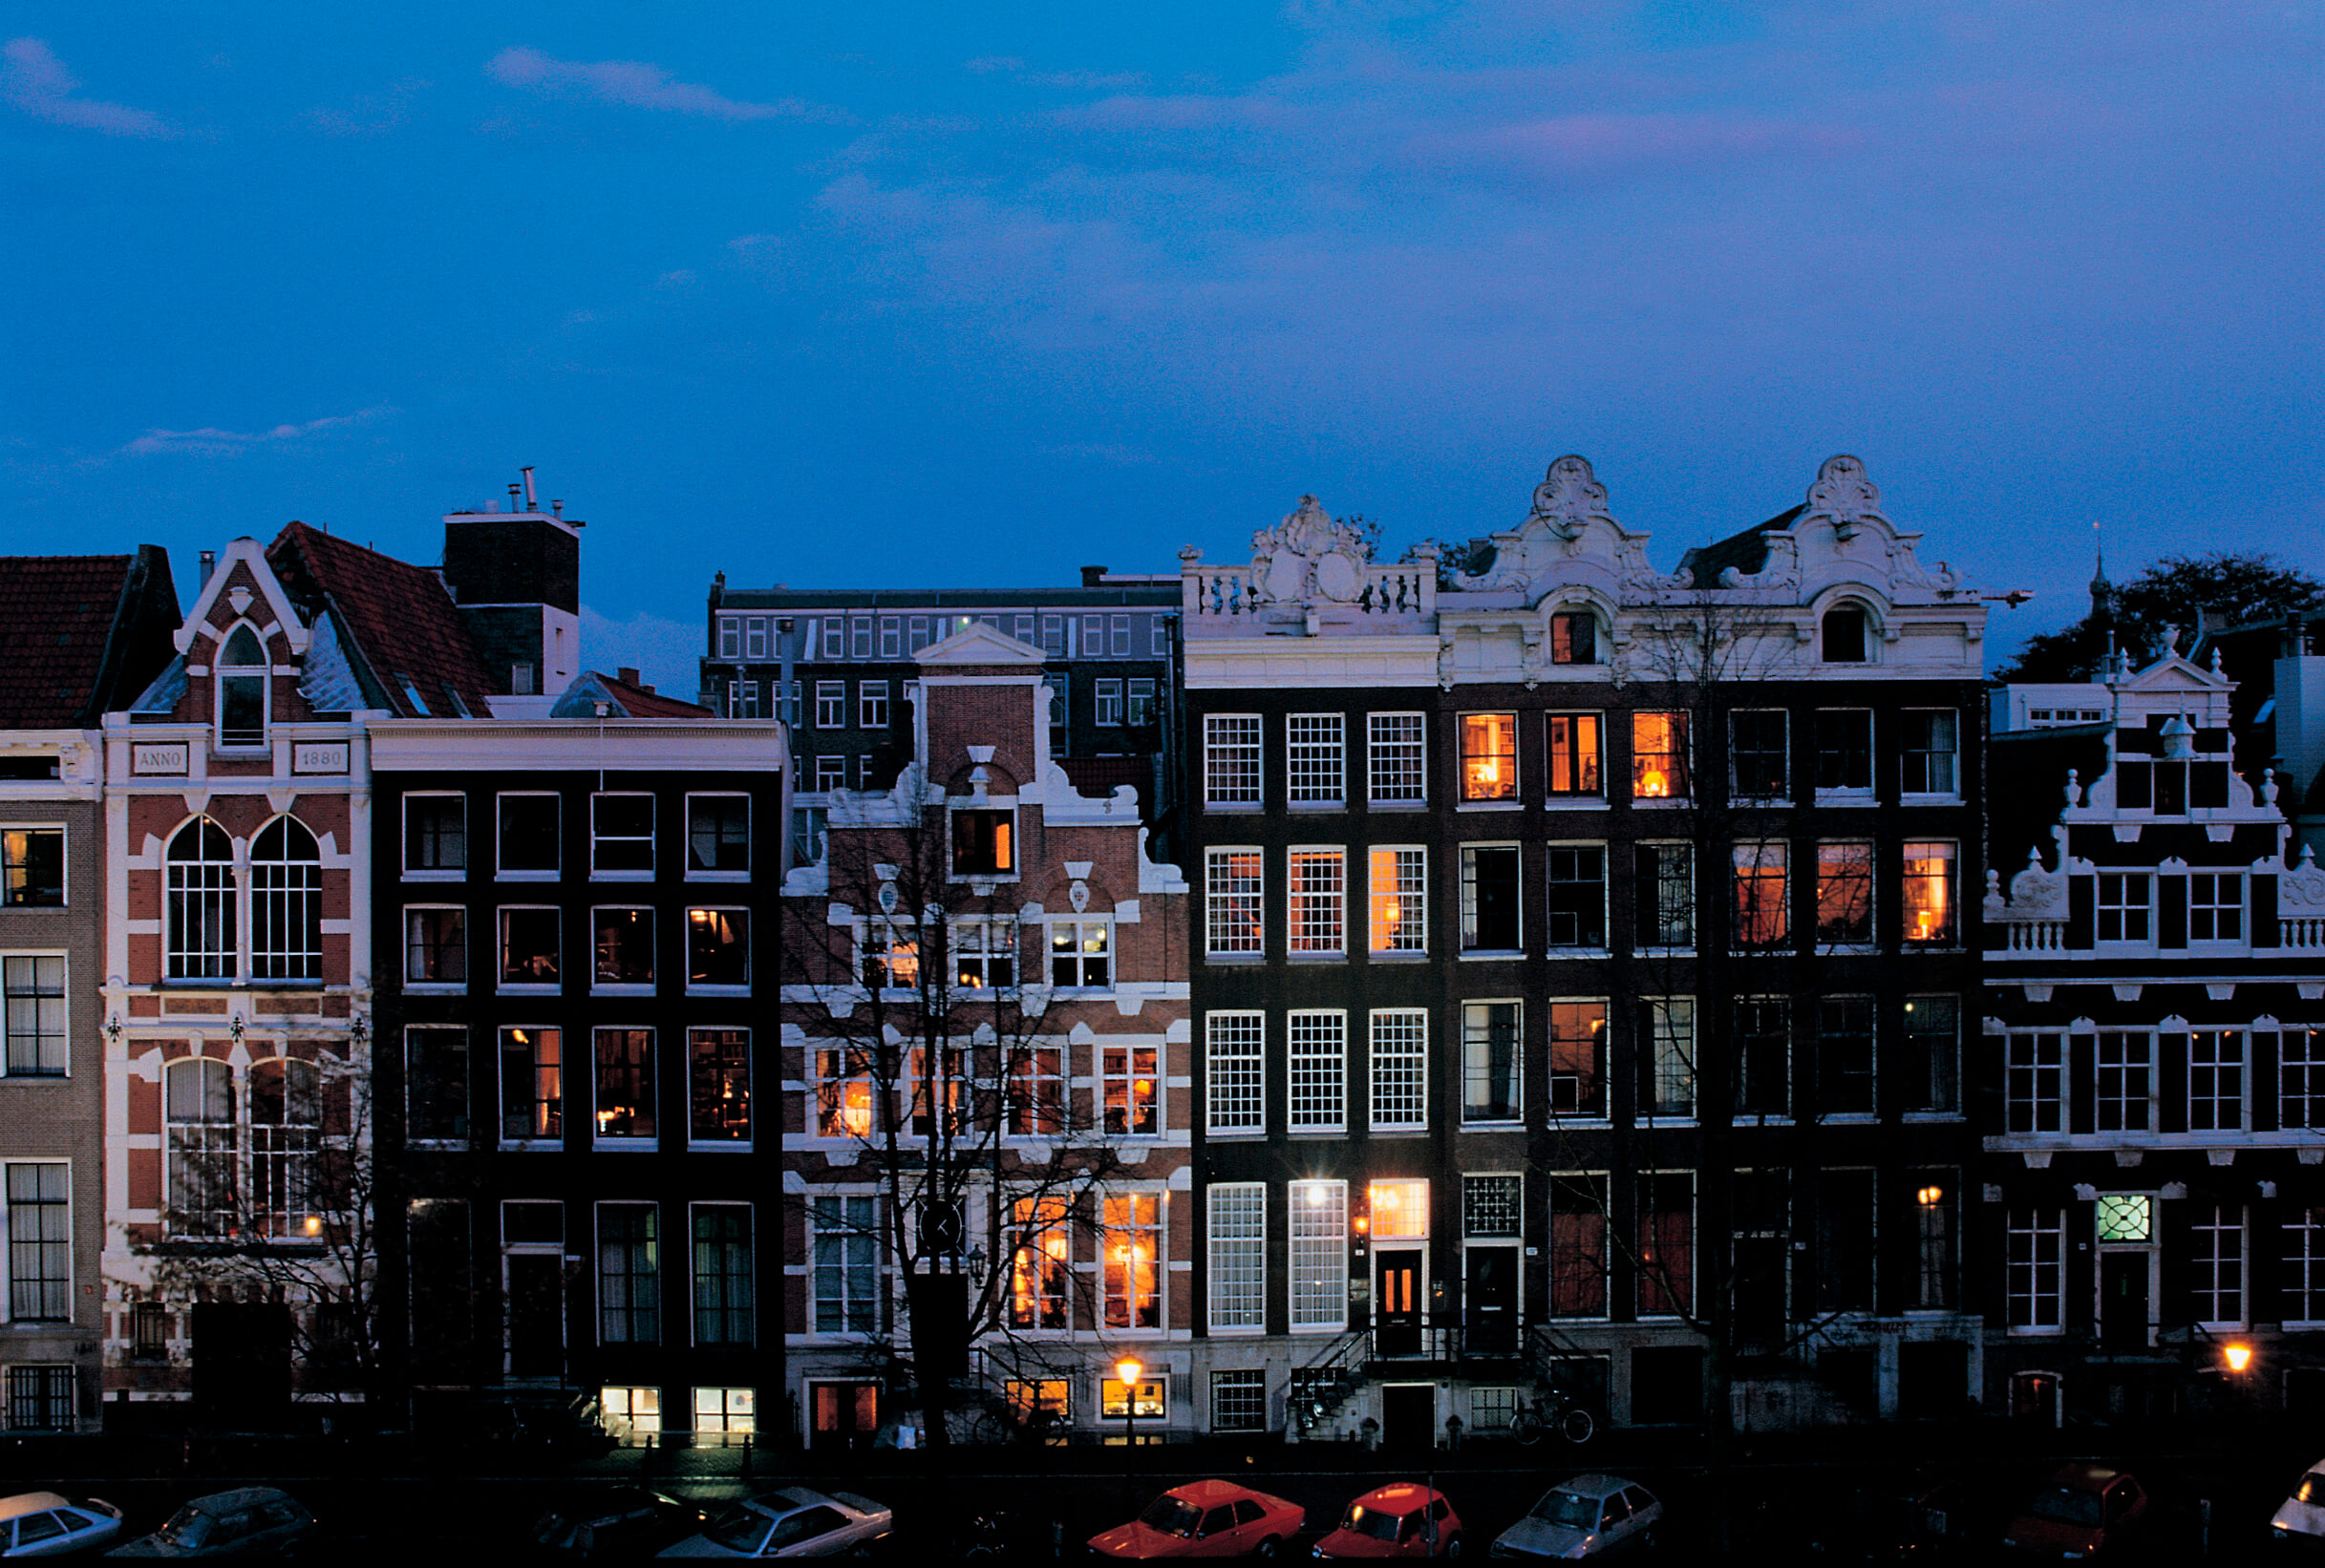 Nieuwenhuijs investment bennekom holland ifrs 10 investment entities amendment 6